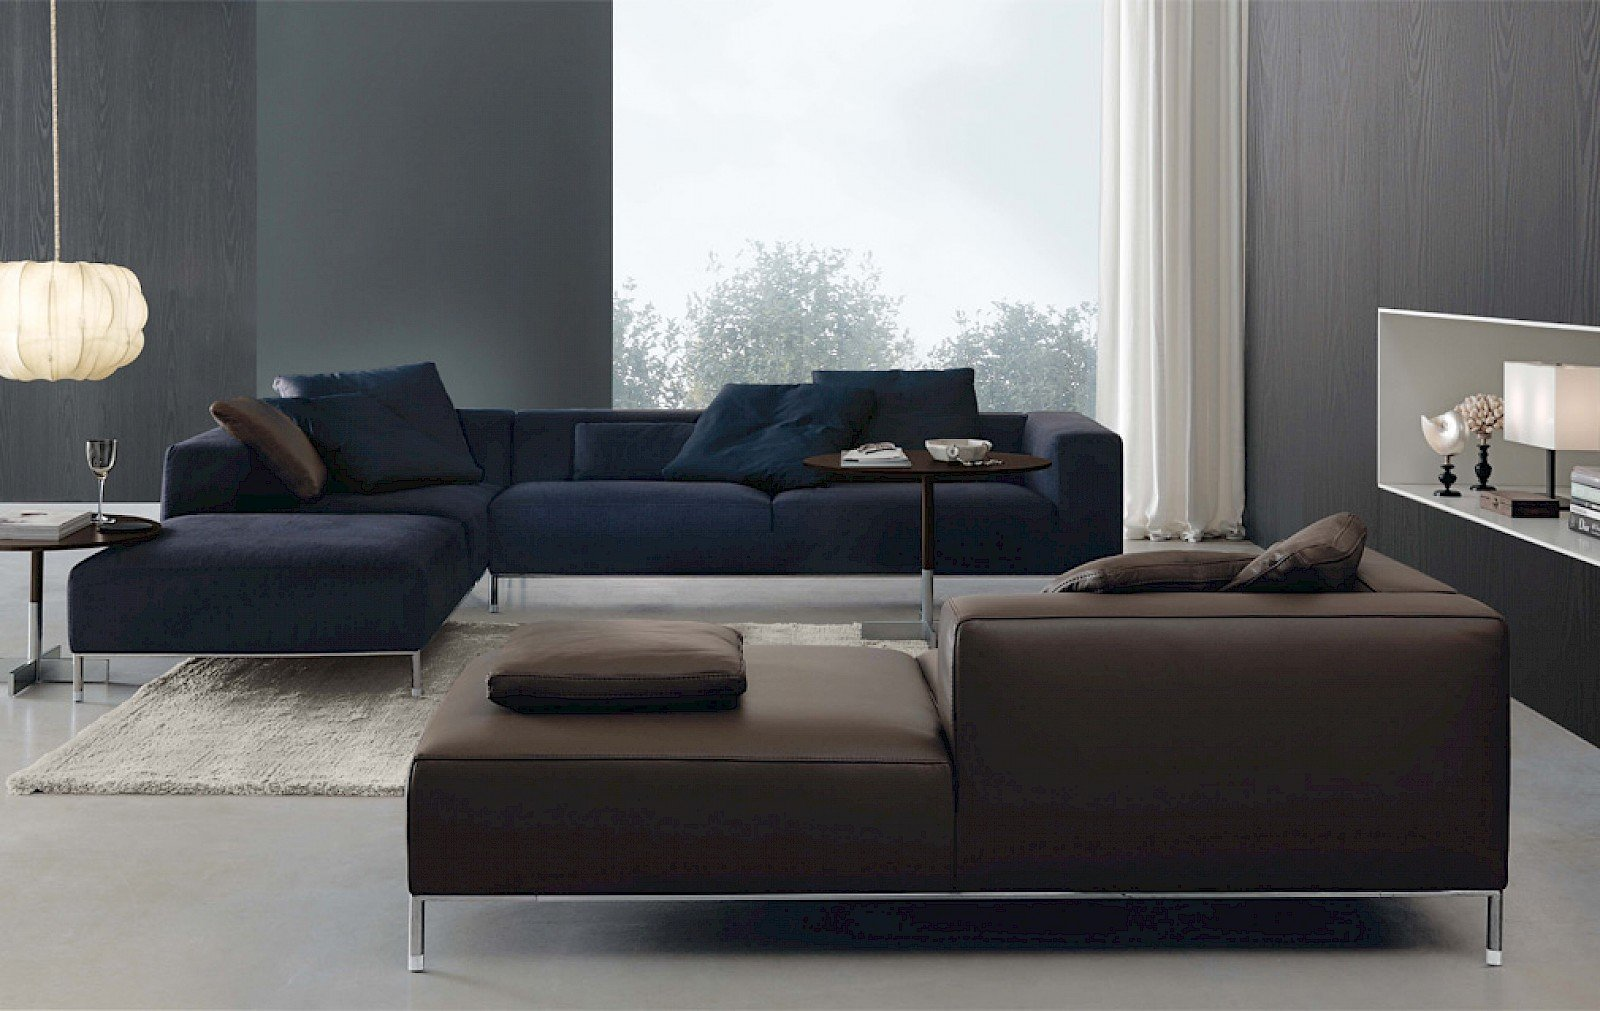 Openplan Design, sofas, Martin, living room, Jesse